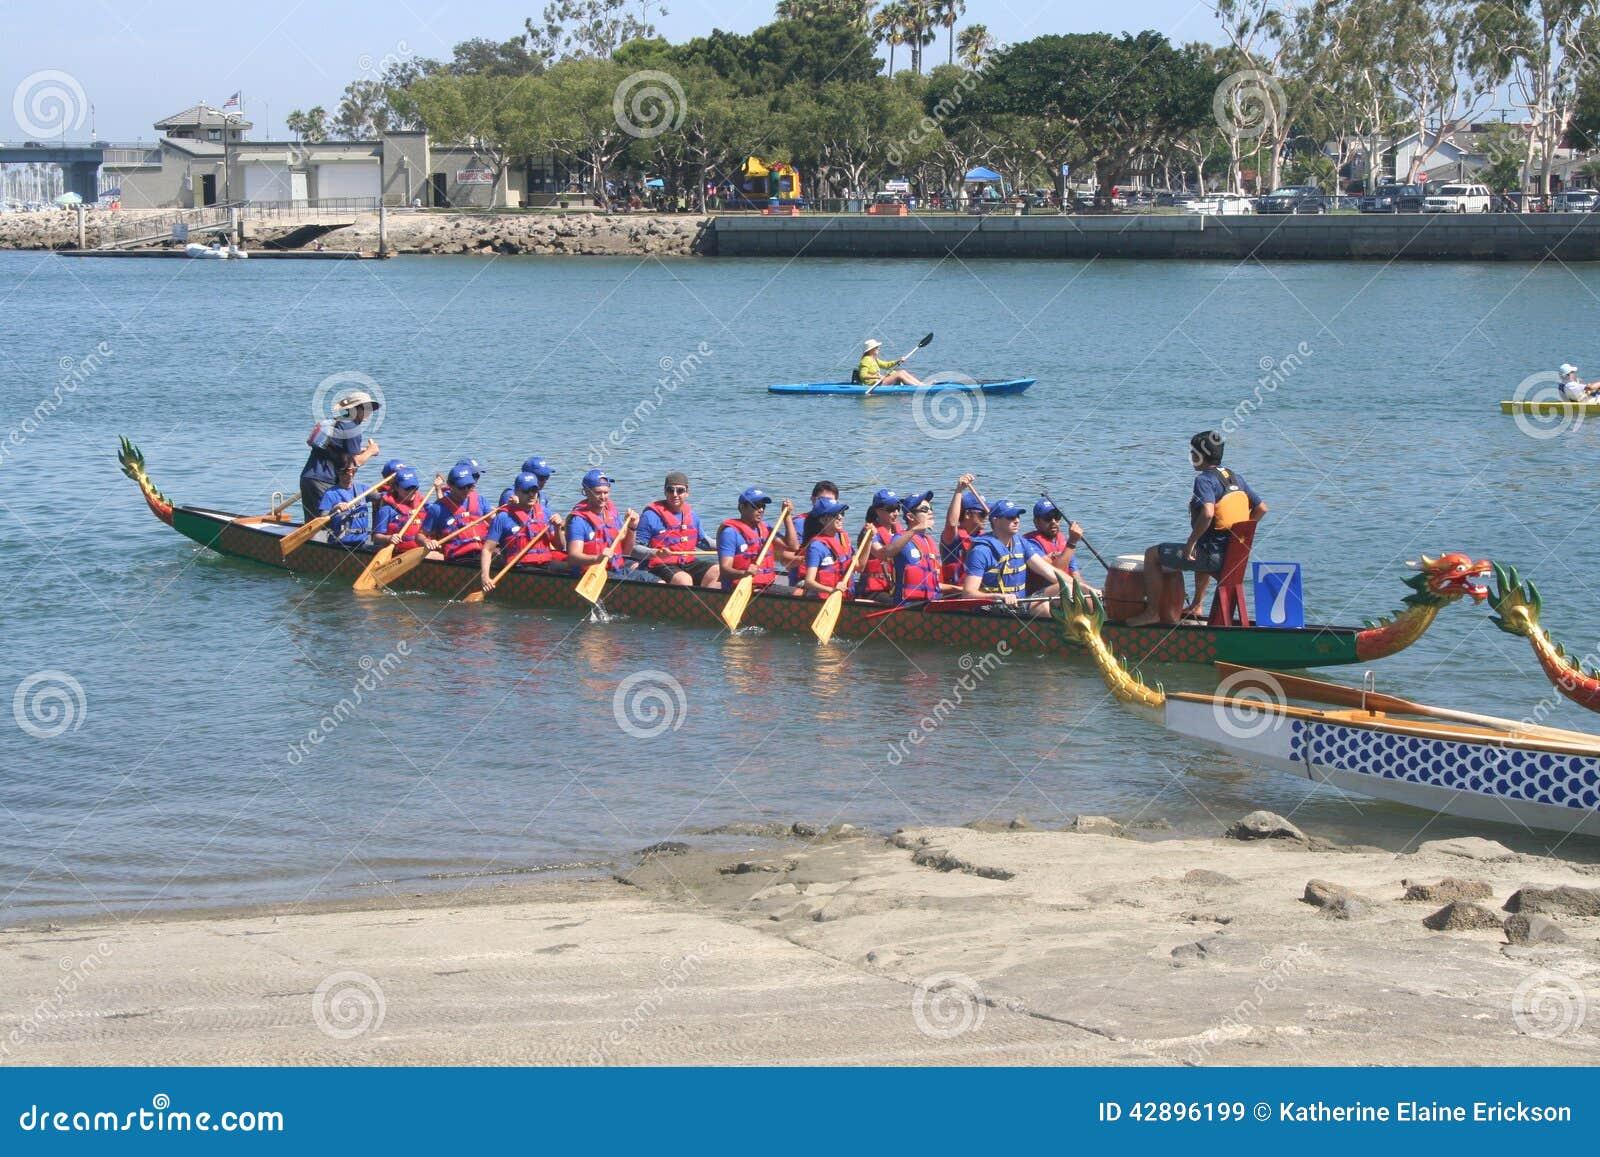 Long Beach Dragon Boat Festival  Results